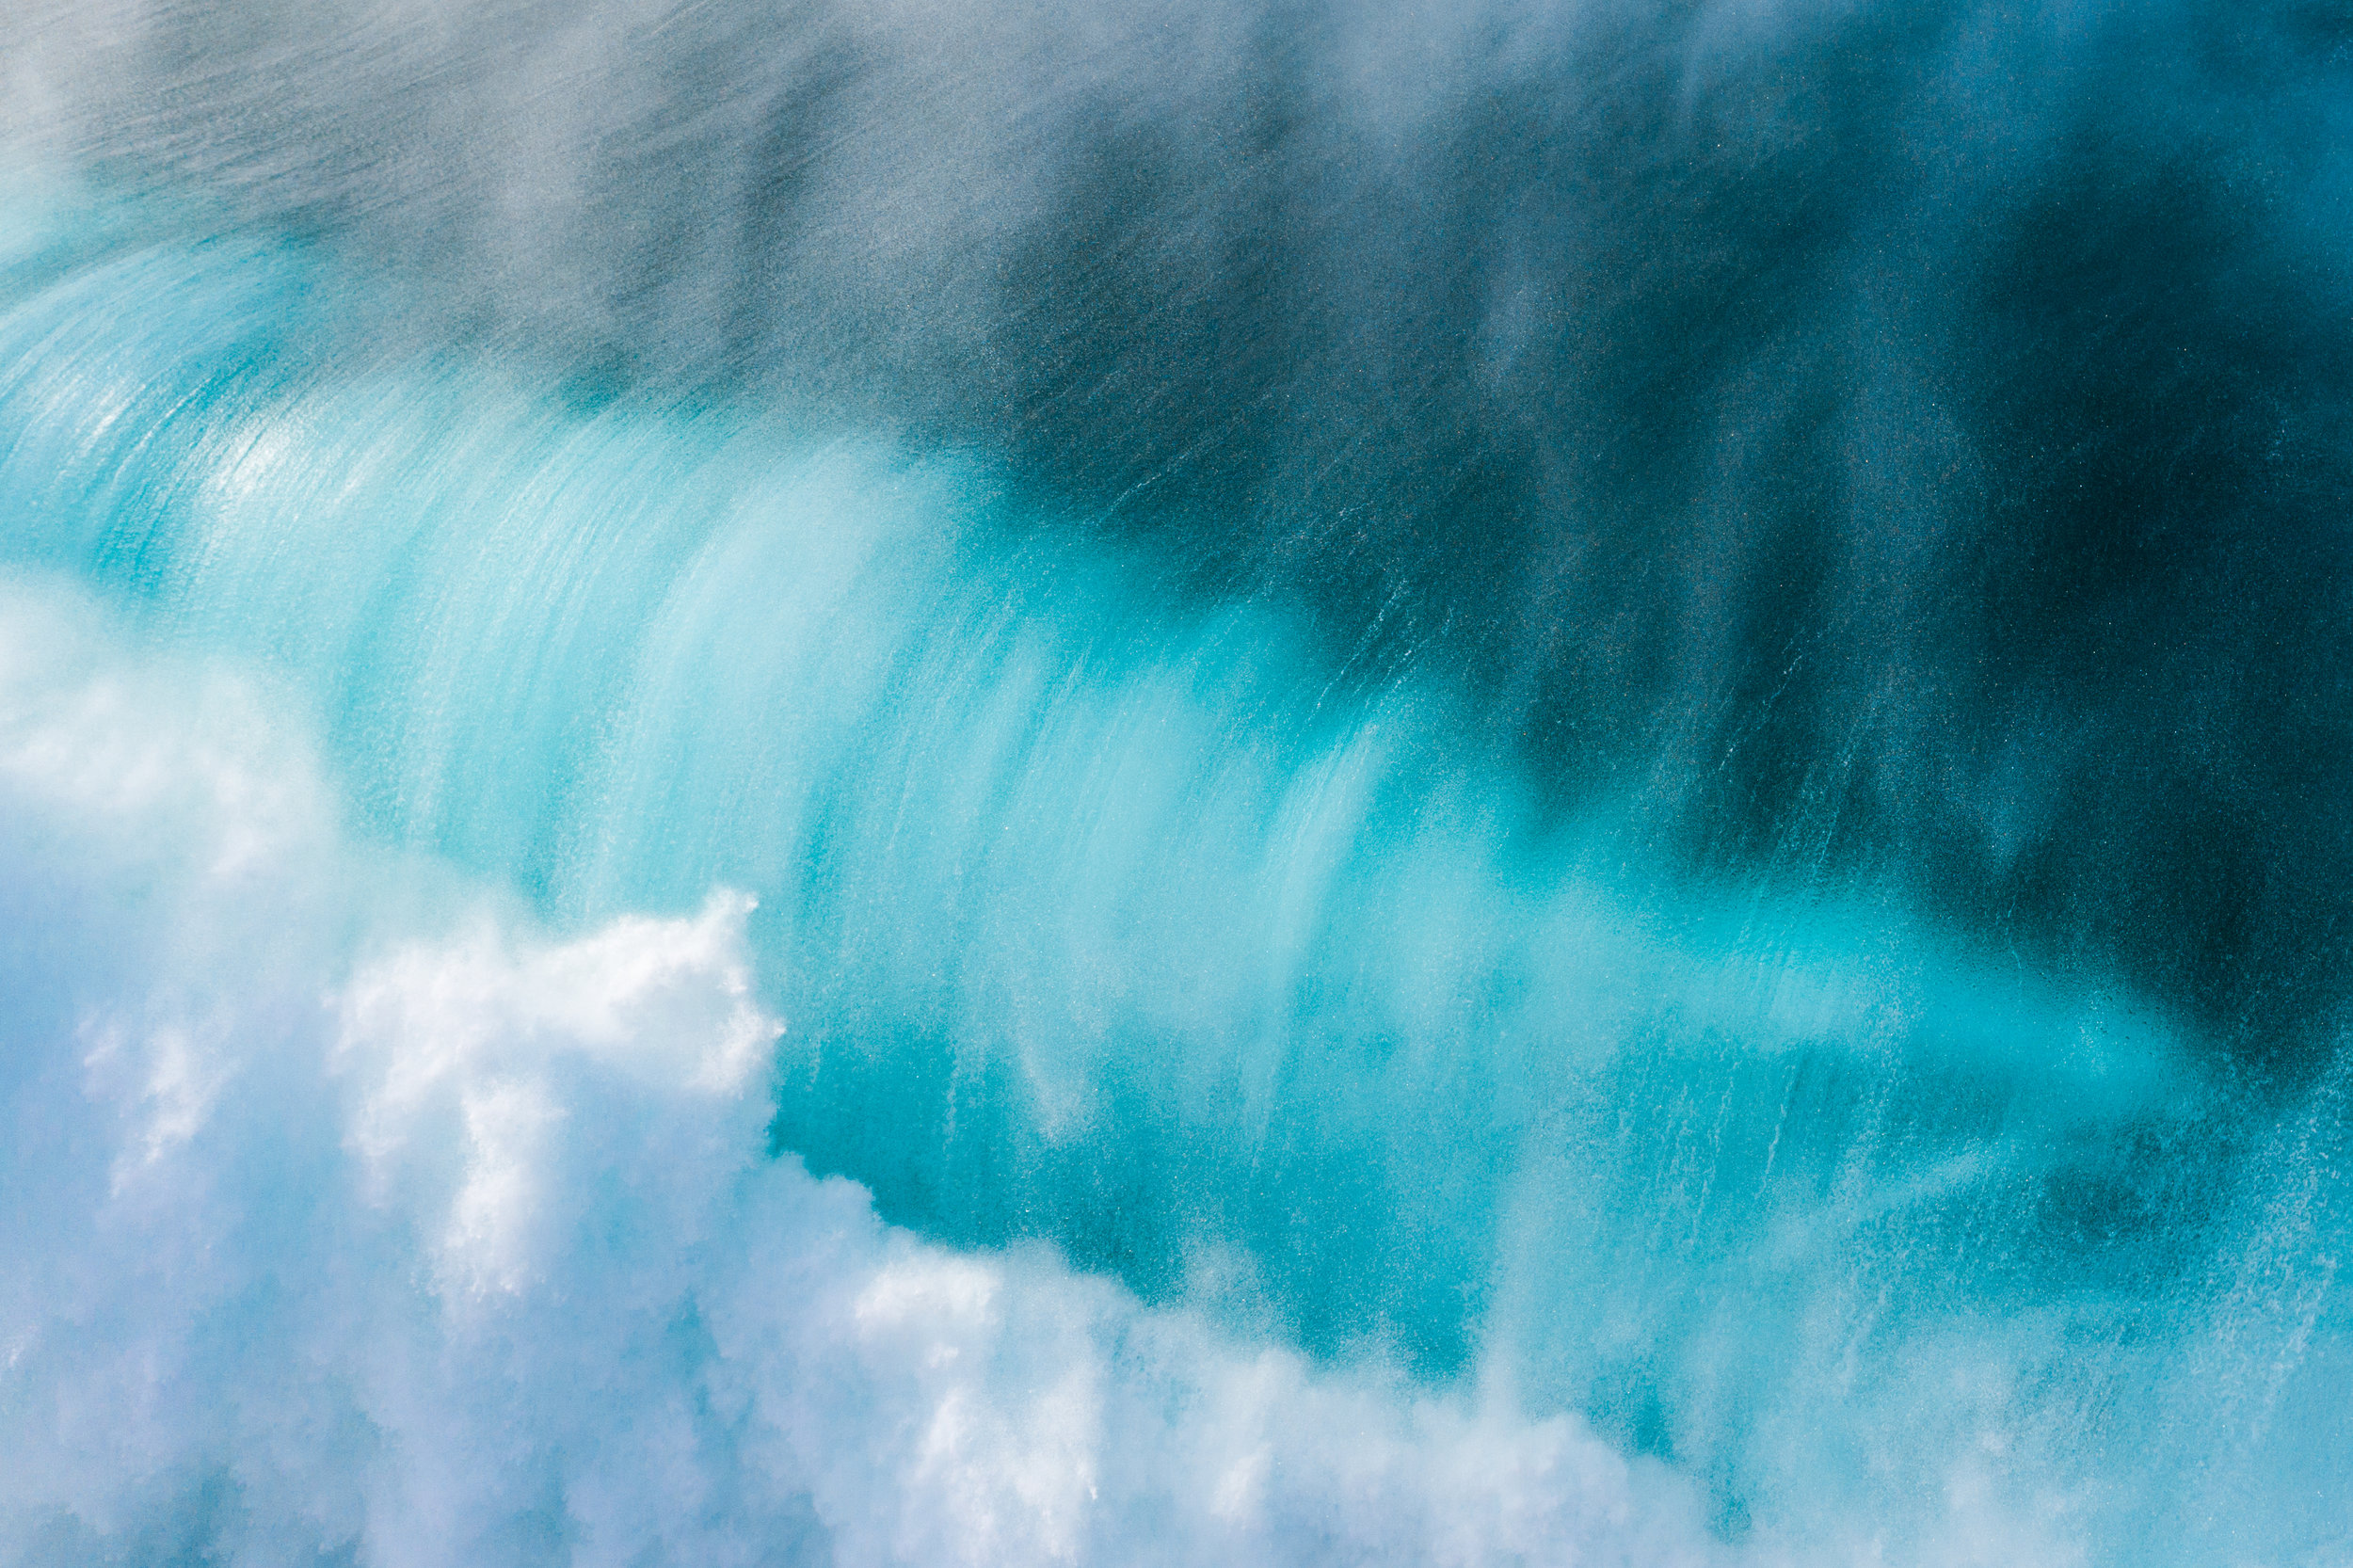 drone wave photo